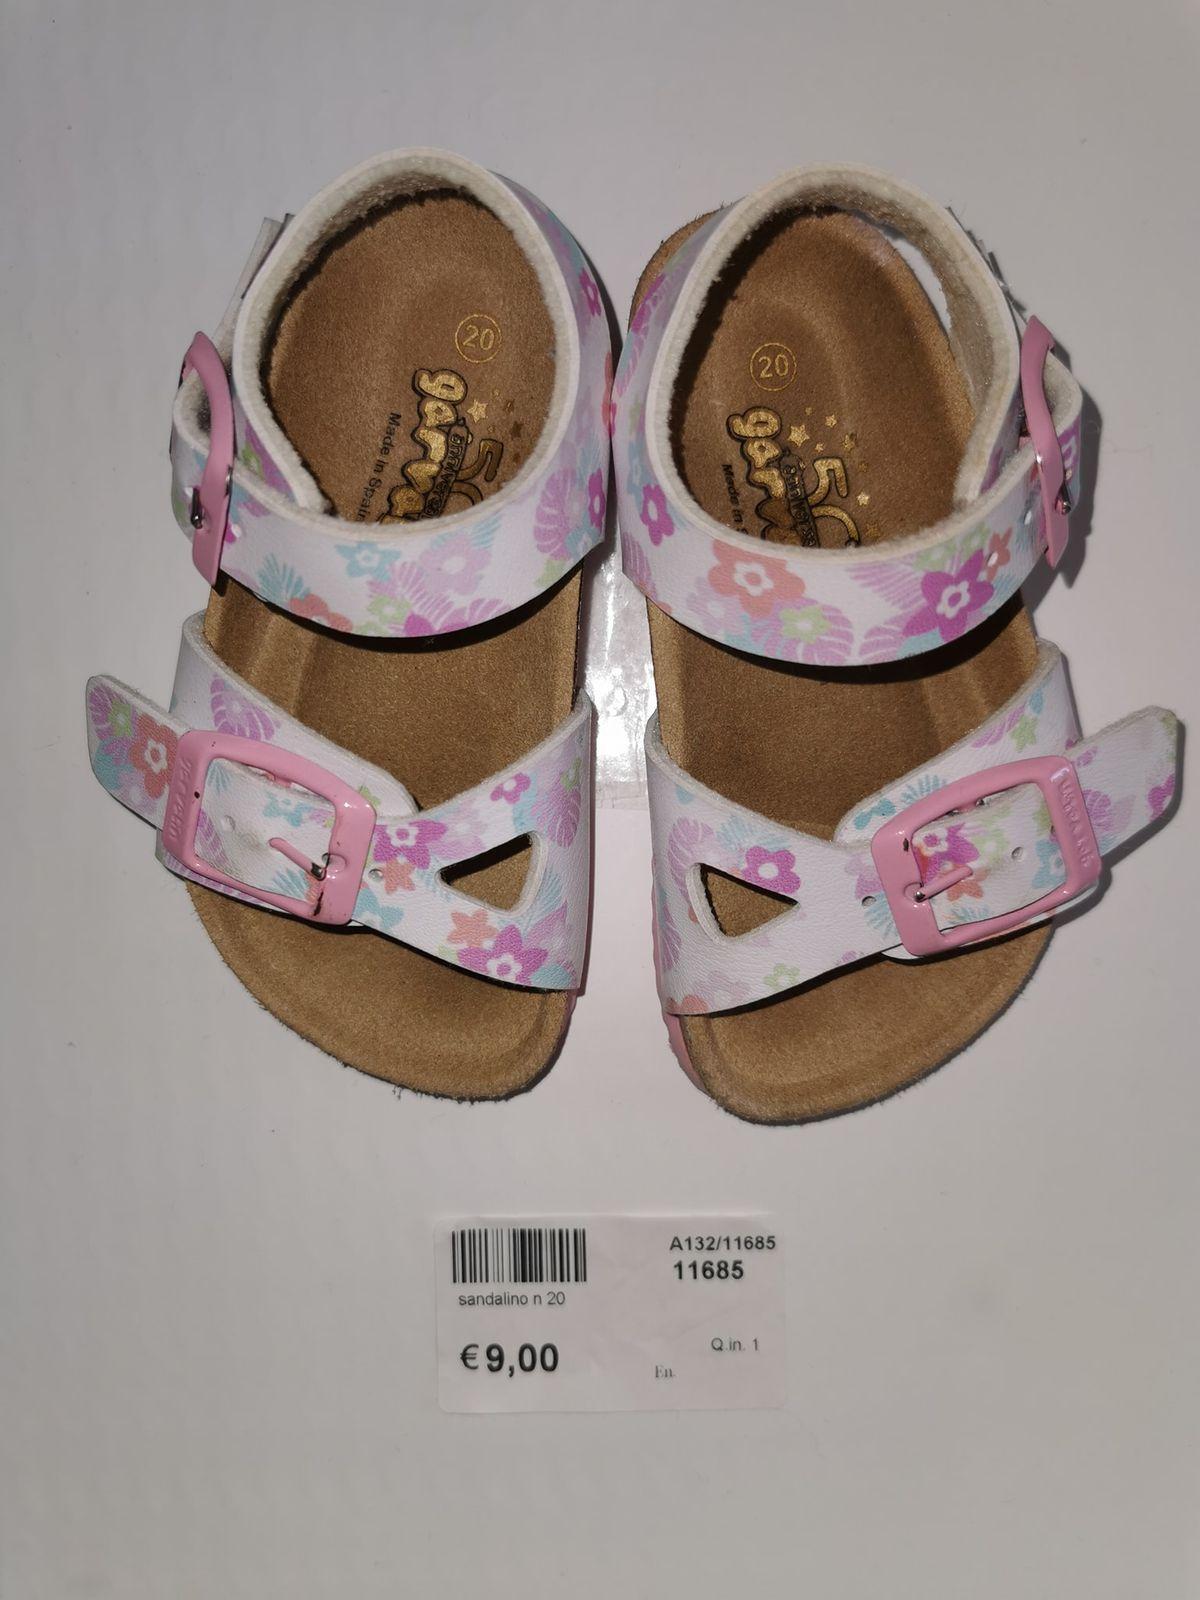 Sandalo Garvalin n.20 codice 11685 Euro 9,00